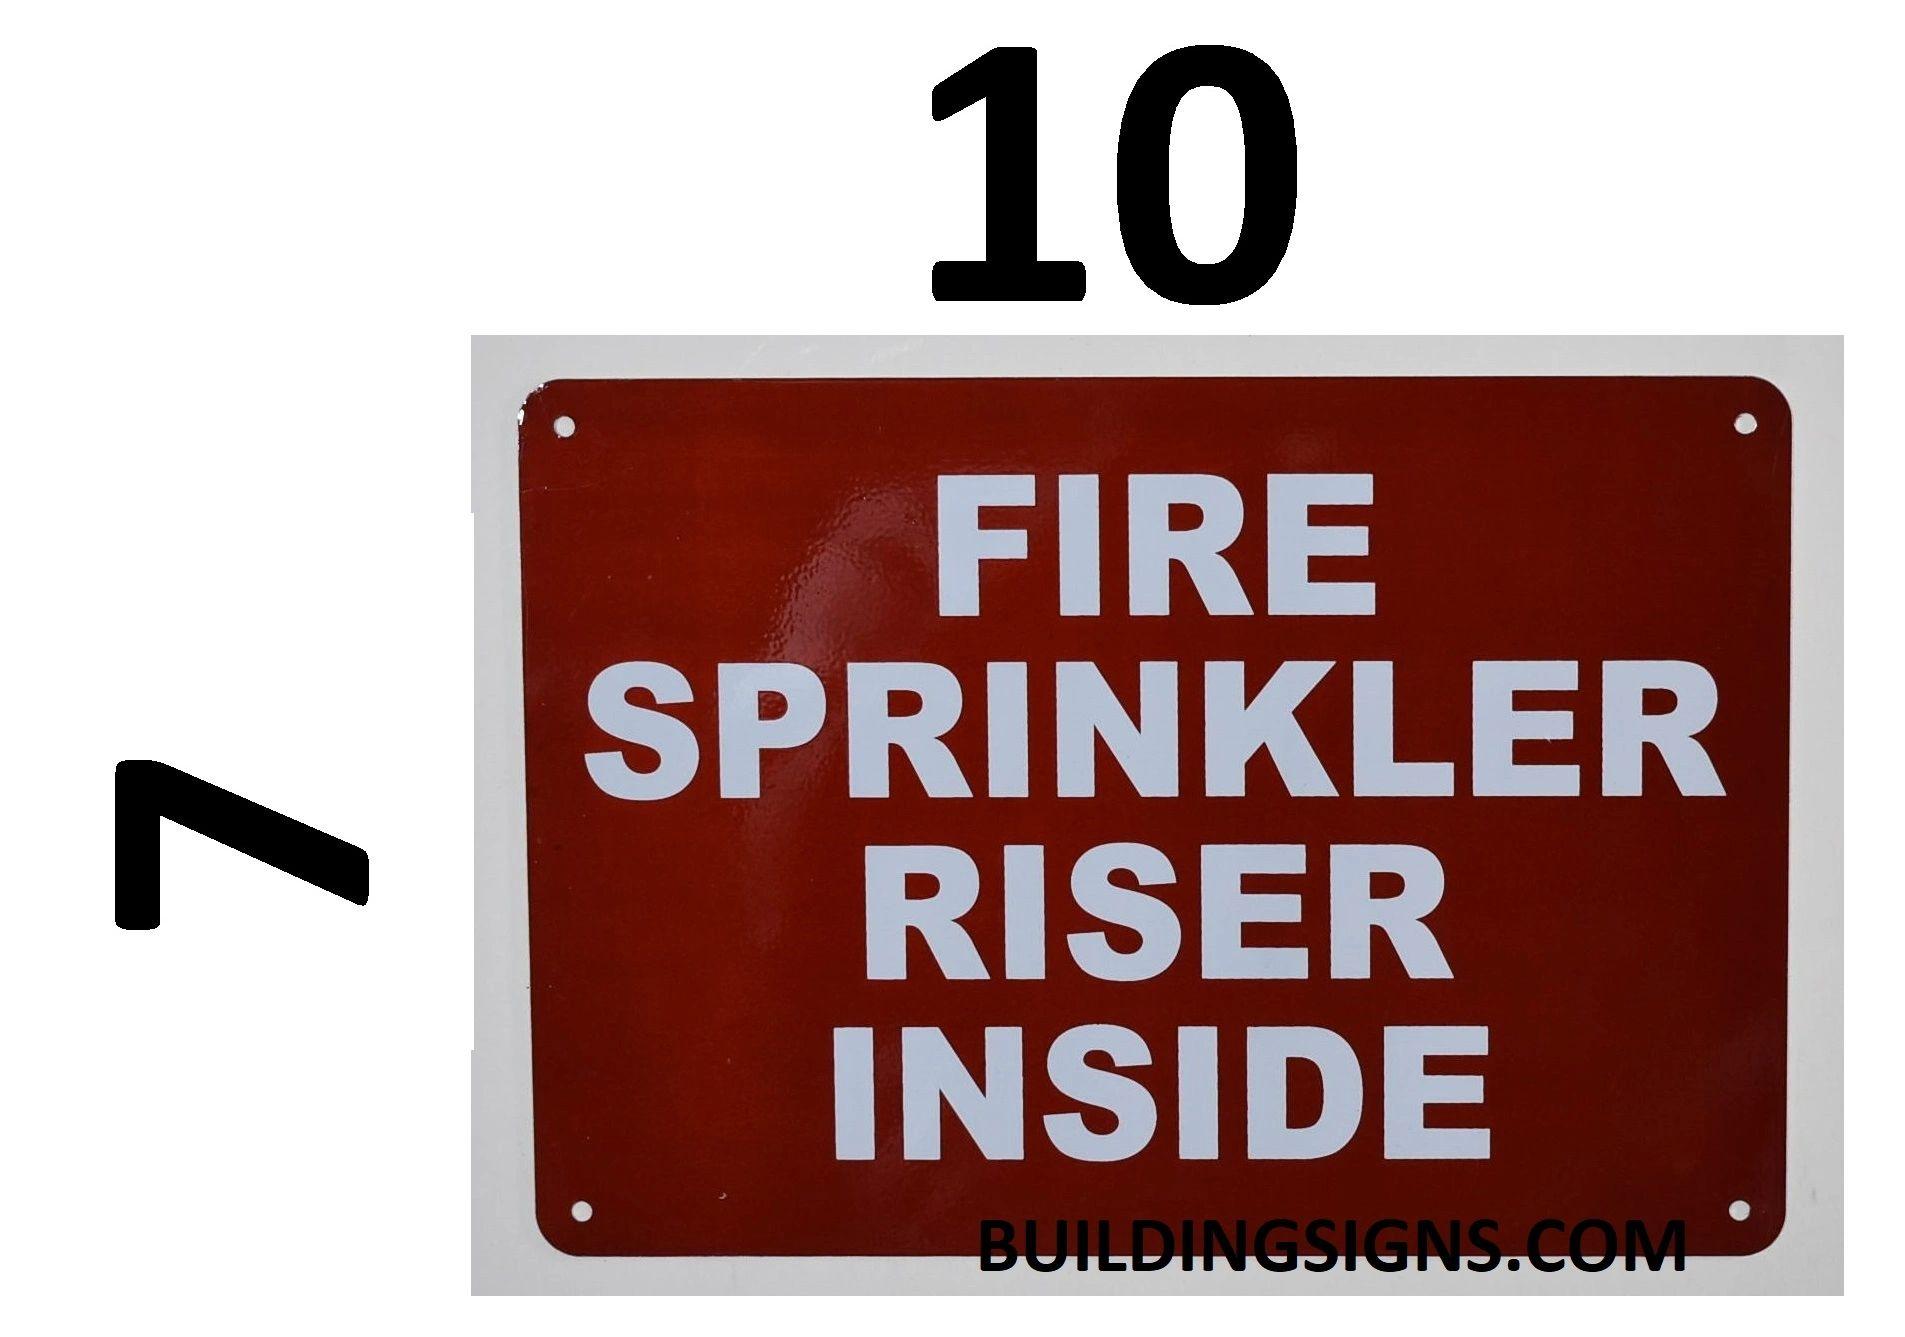 FIRE SPRINKLER RISER INSIDE SIGN- REFLECTIVE !!! (ALUMINUM SIGNS 7X10)